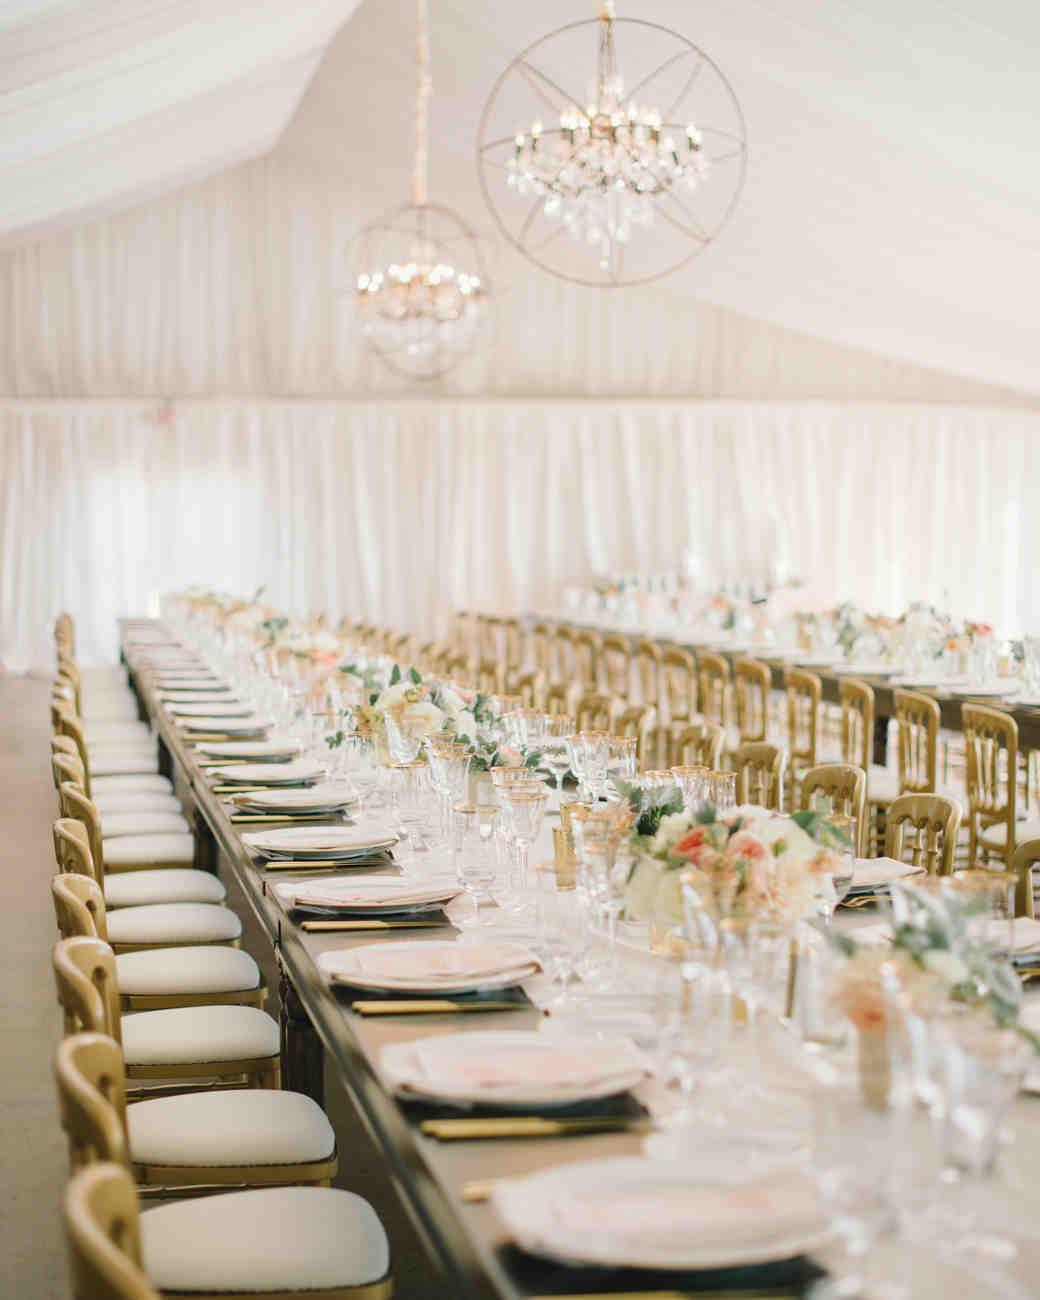 alex-brandon-wedding-tables-052-s111338-0714.jpg